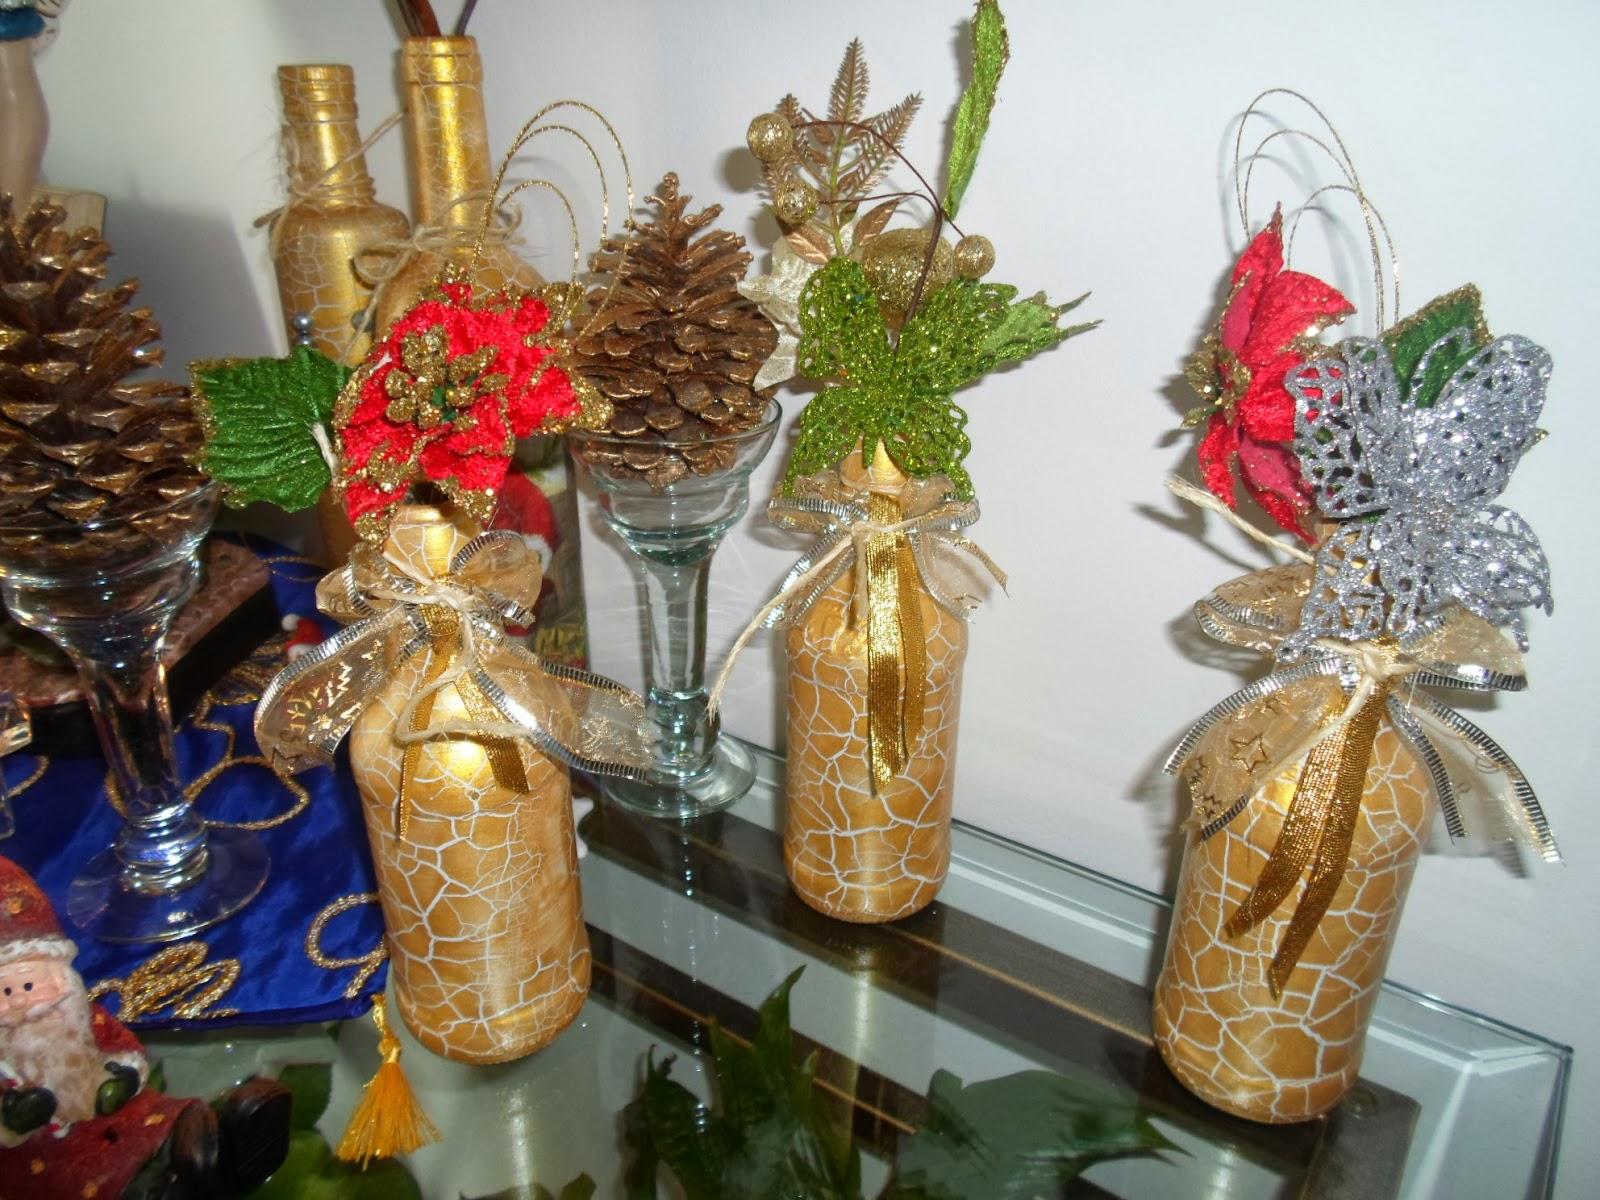 #AF1C27 garrafa em craquele lisa de natal garrafa de vidro 194 Janelas De Vidro Natal